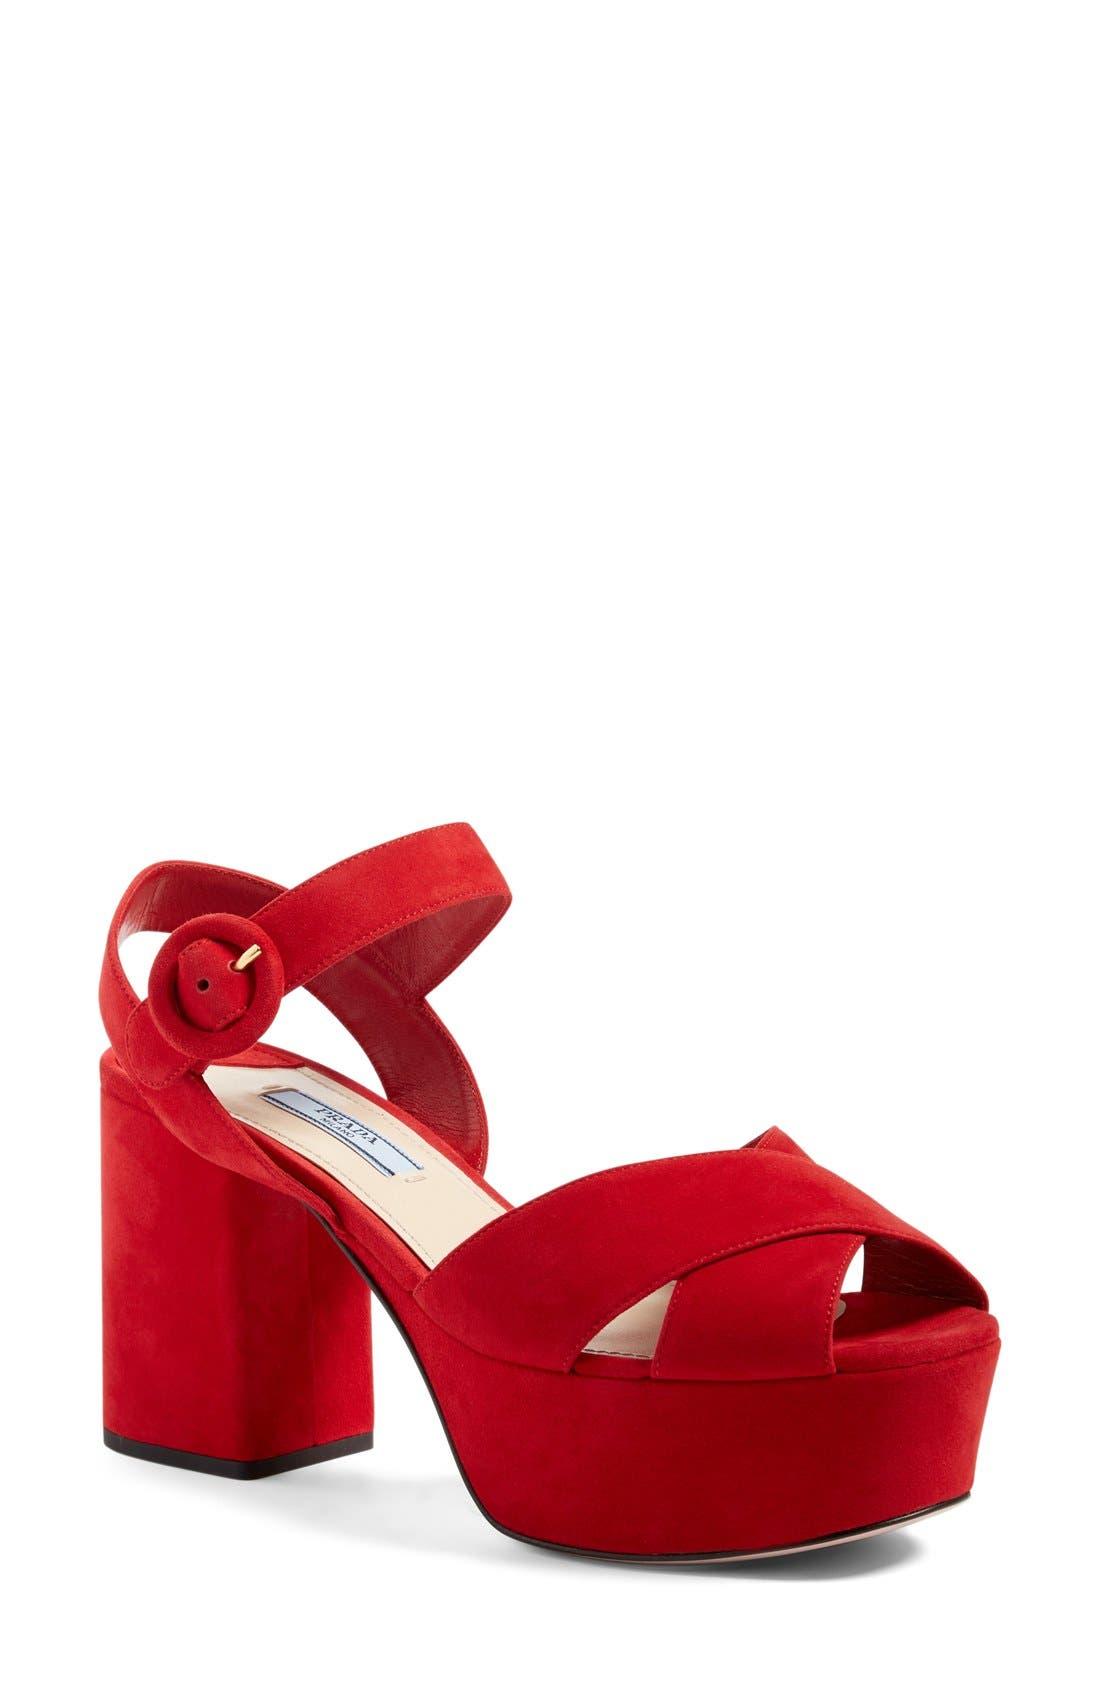 Alternate Image 1 Selected - Prada Strappy Platform Sandal (Women)